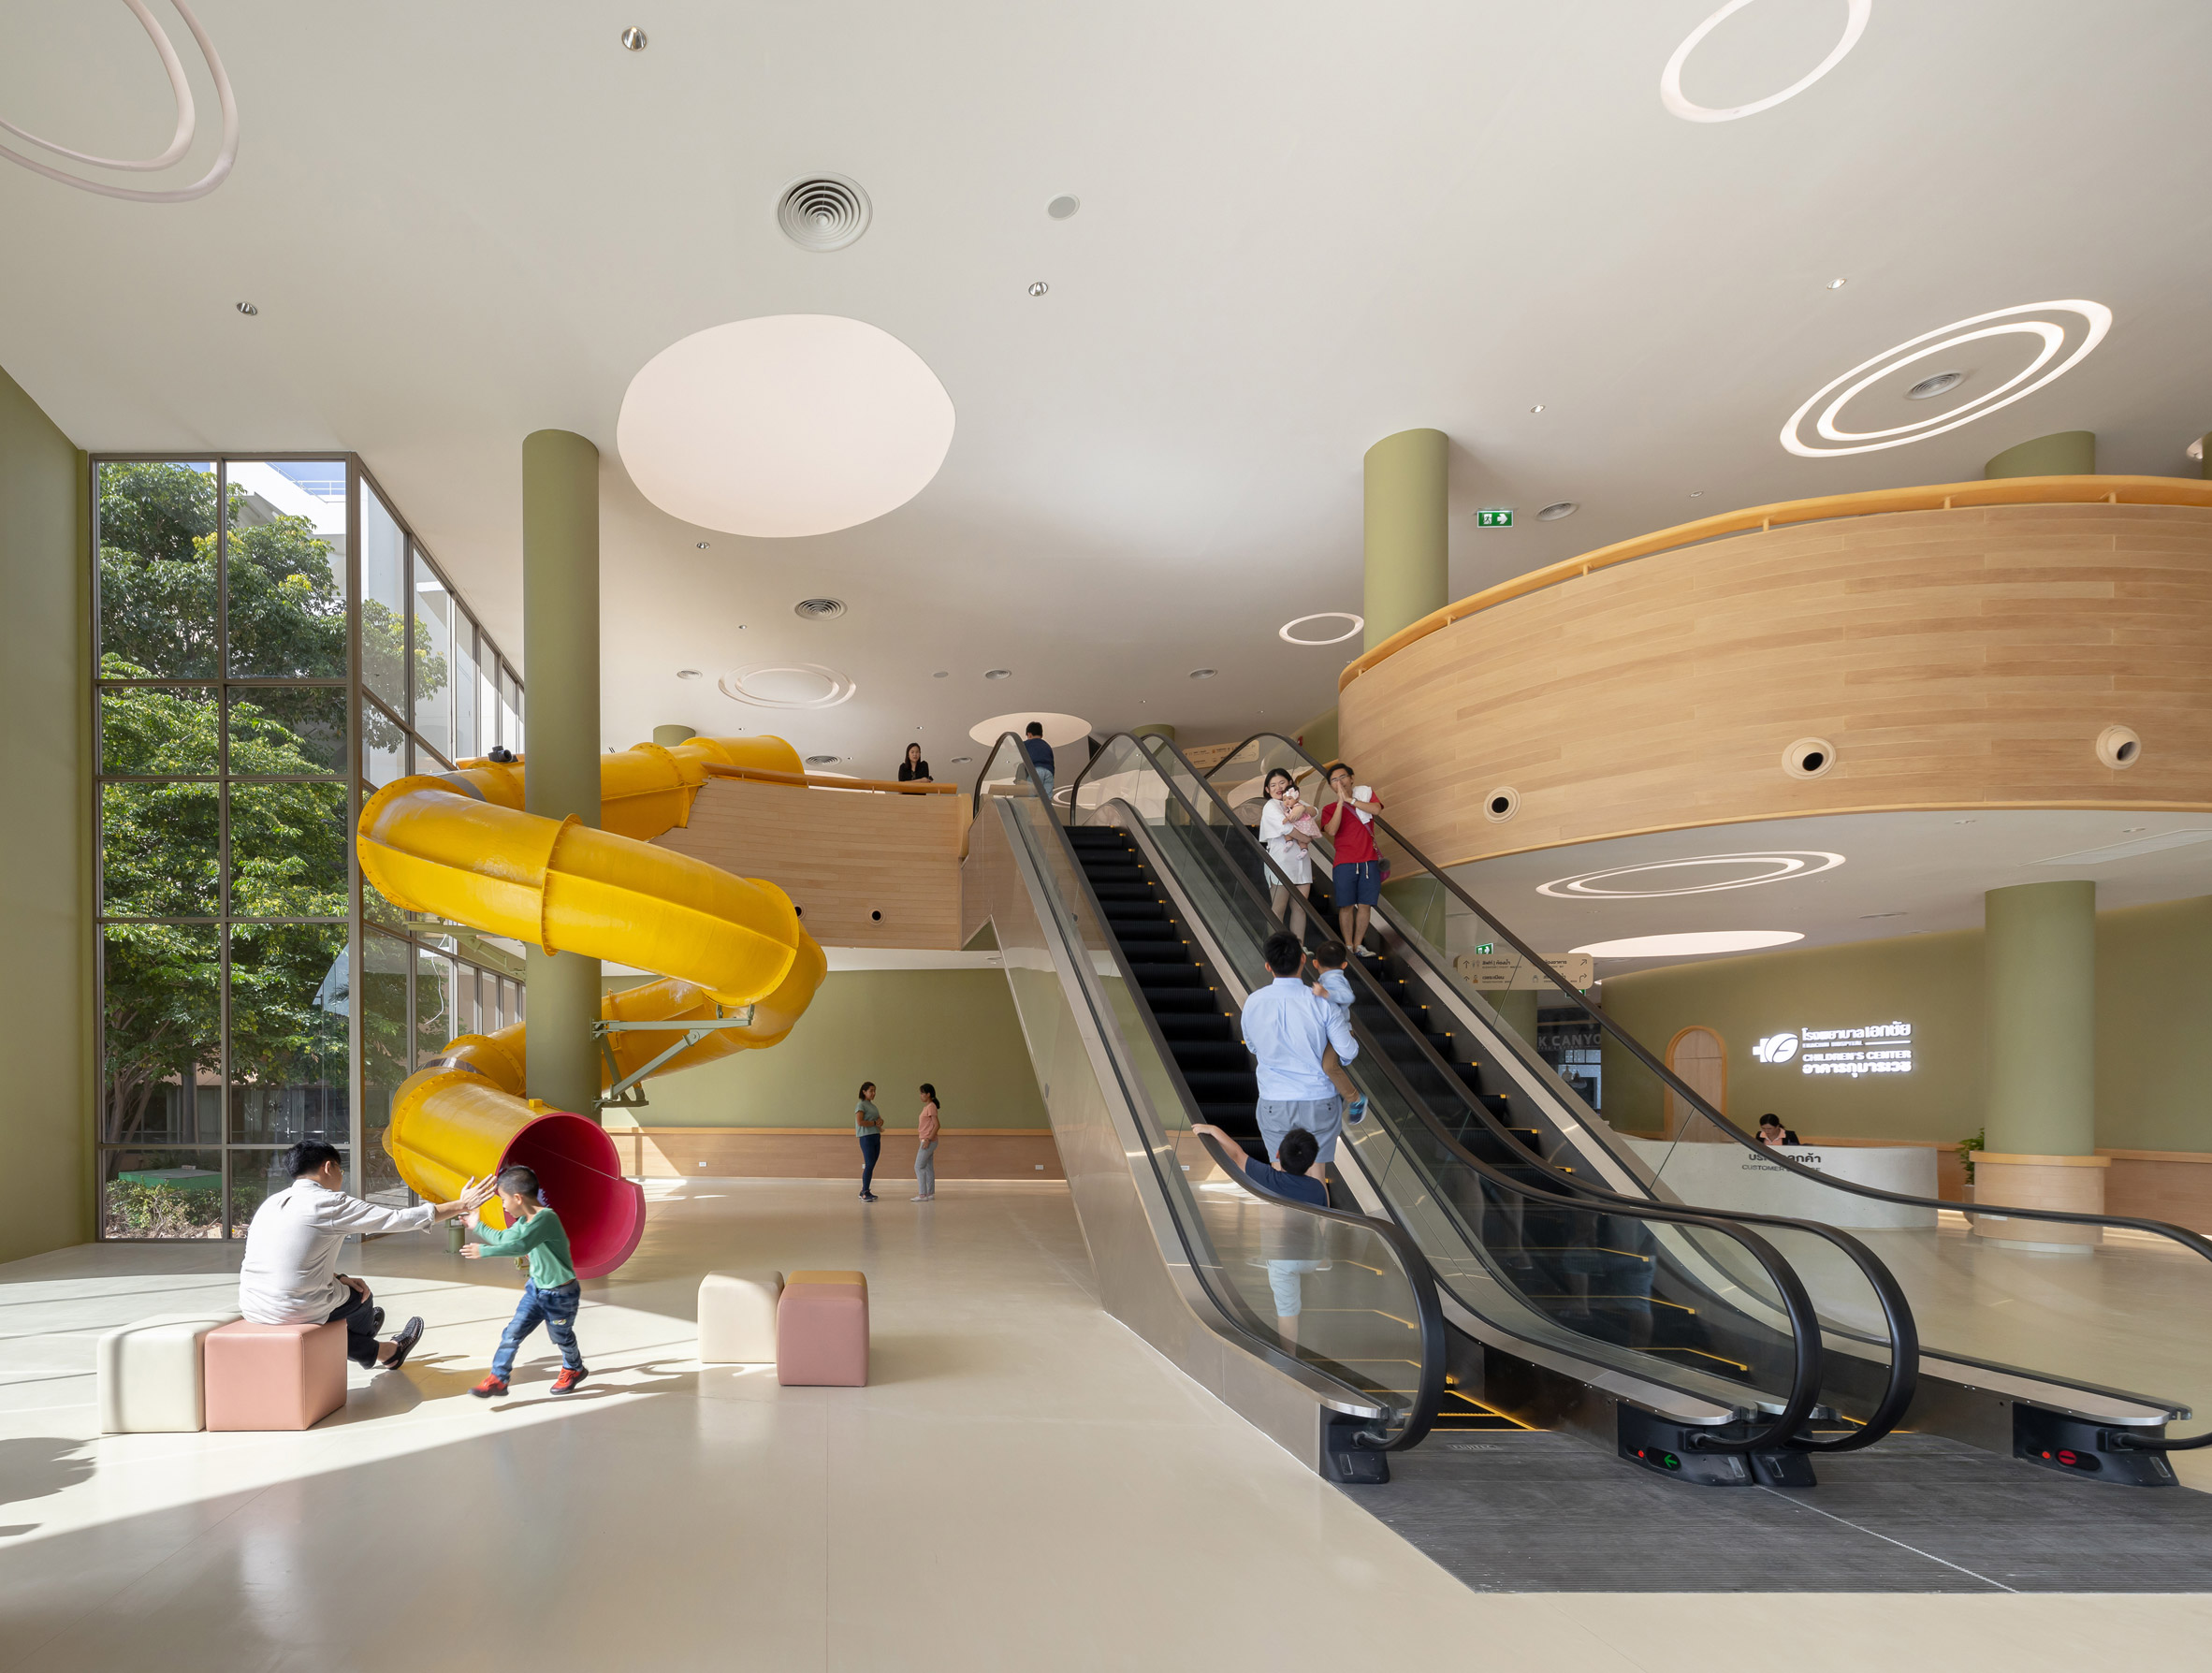 Yllow spiral slide in waiting room of children's hospital